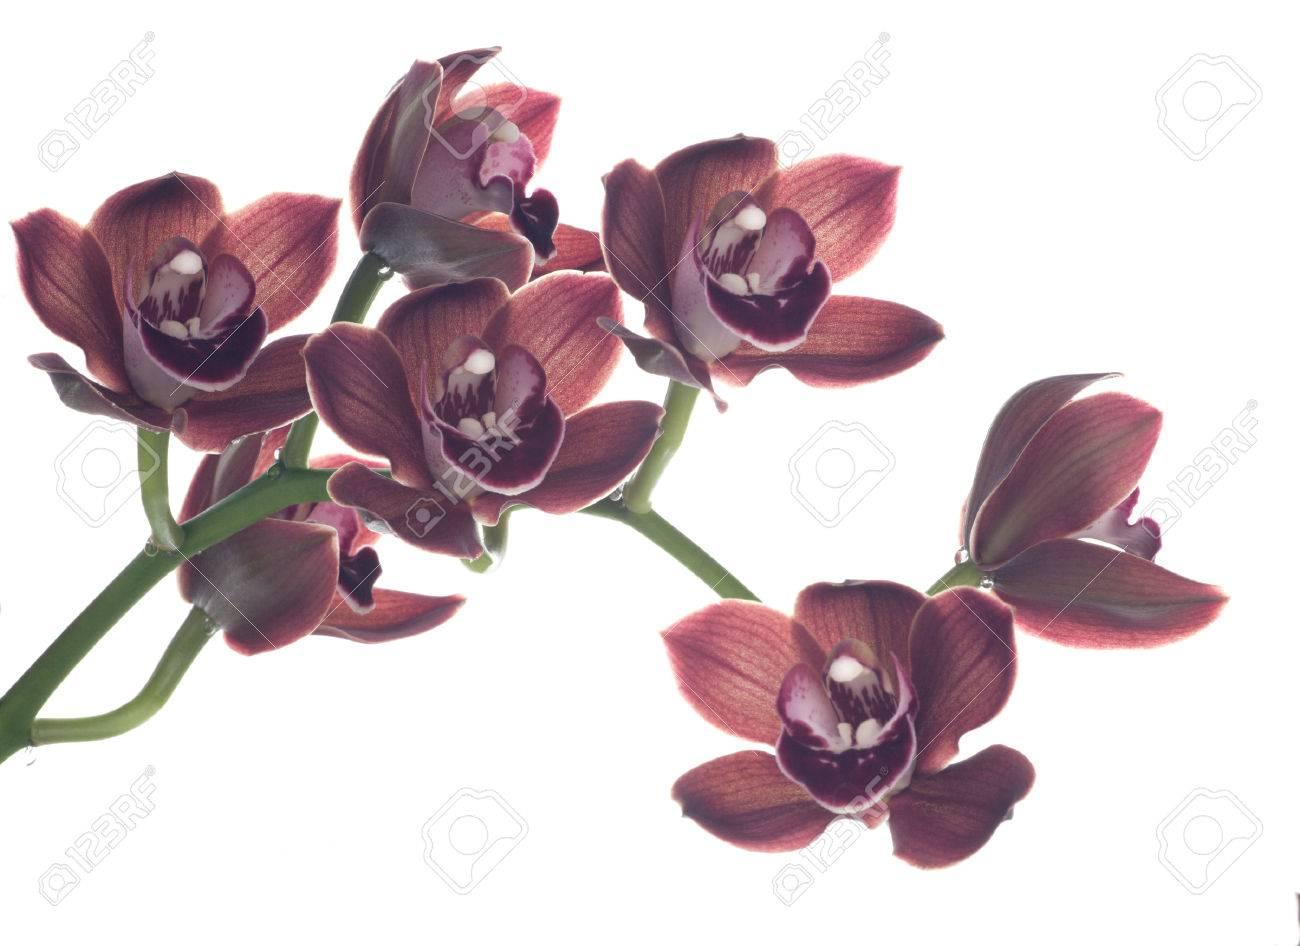 From Aalsmeer Auction Cymbidium Orchid Aquarella Love